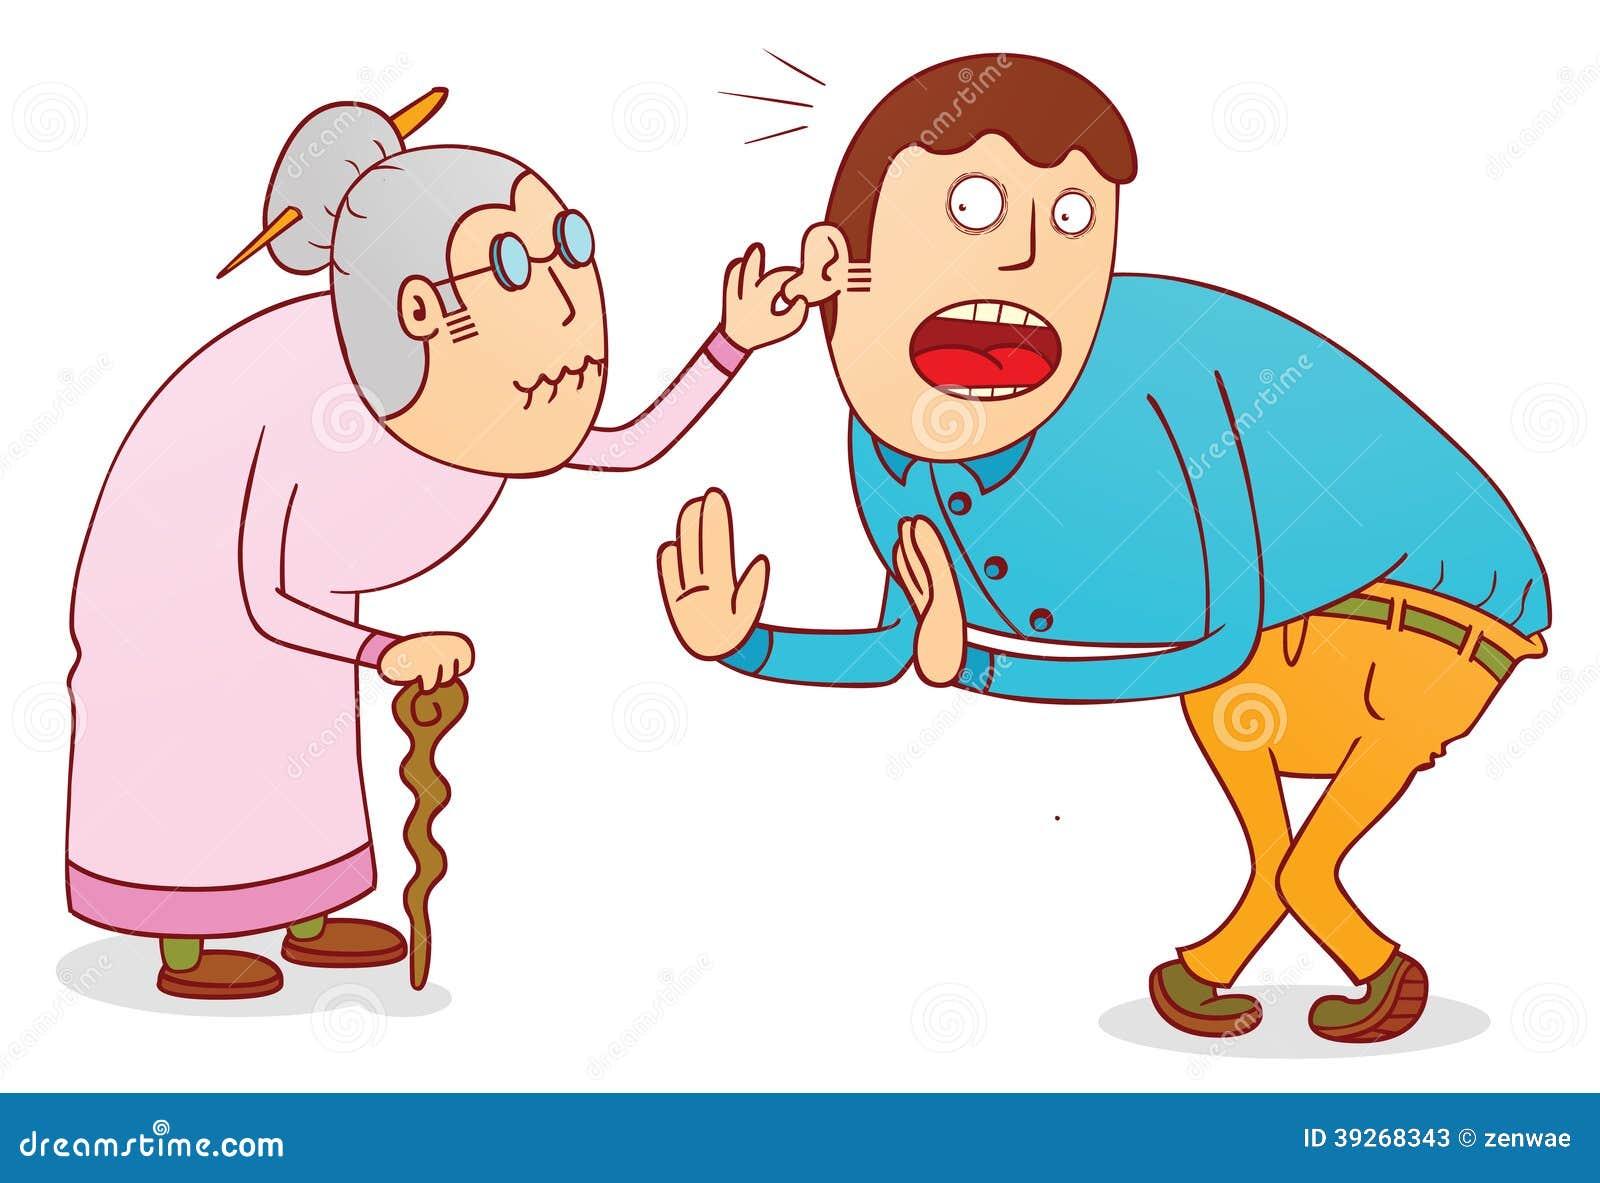 funny granny clipart - photo #37